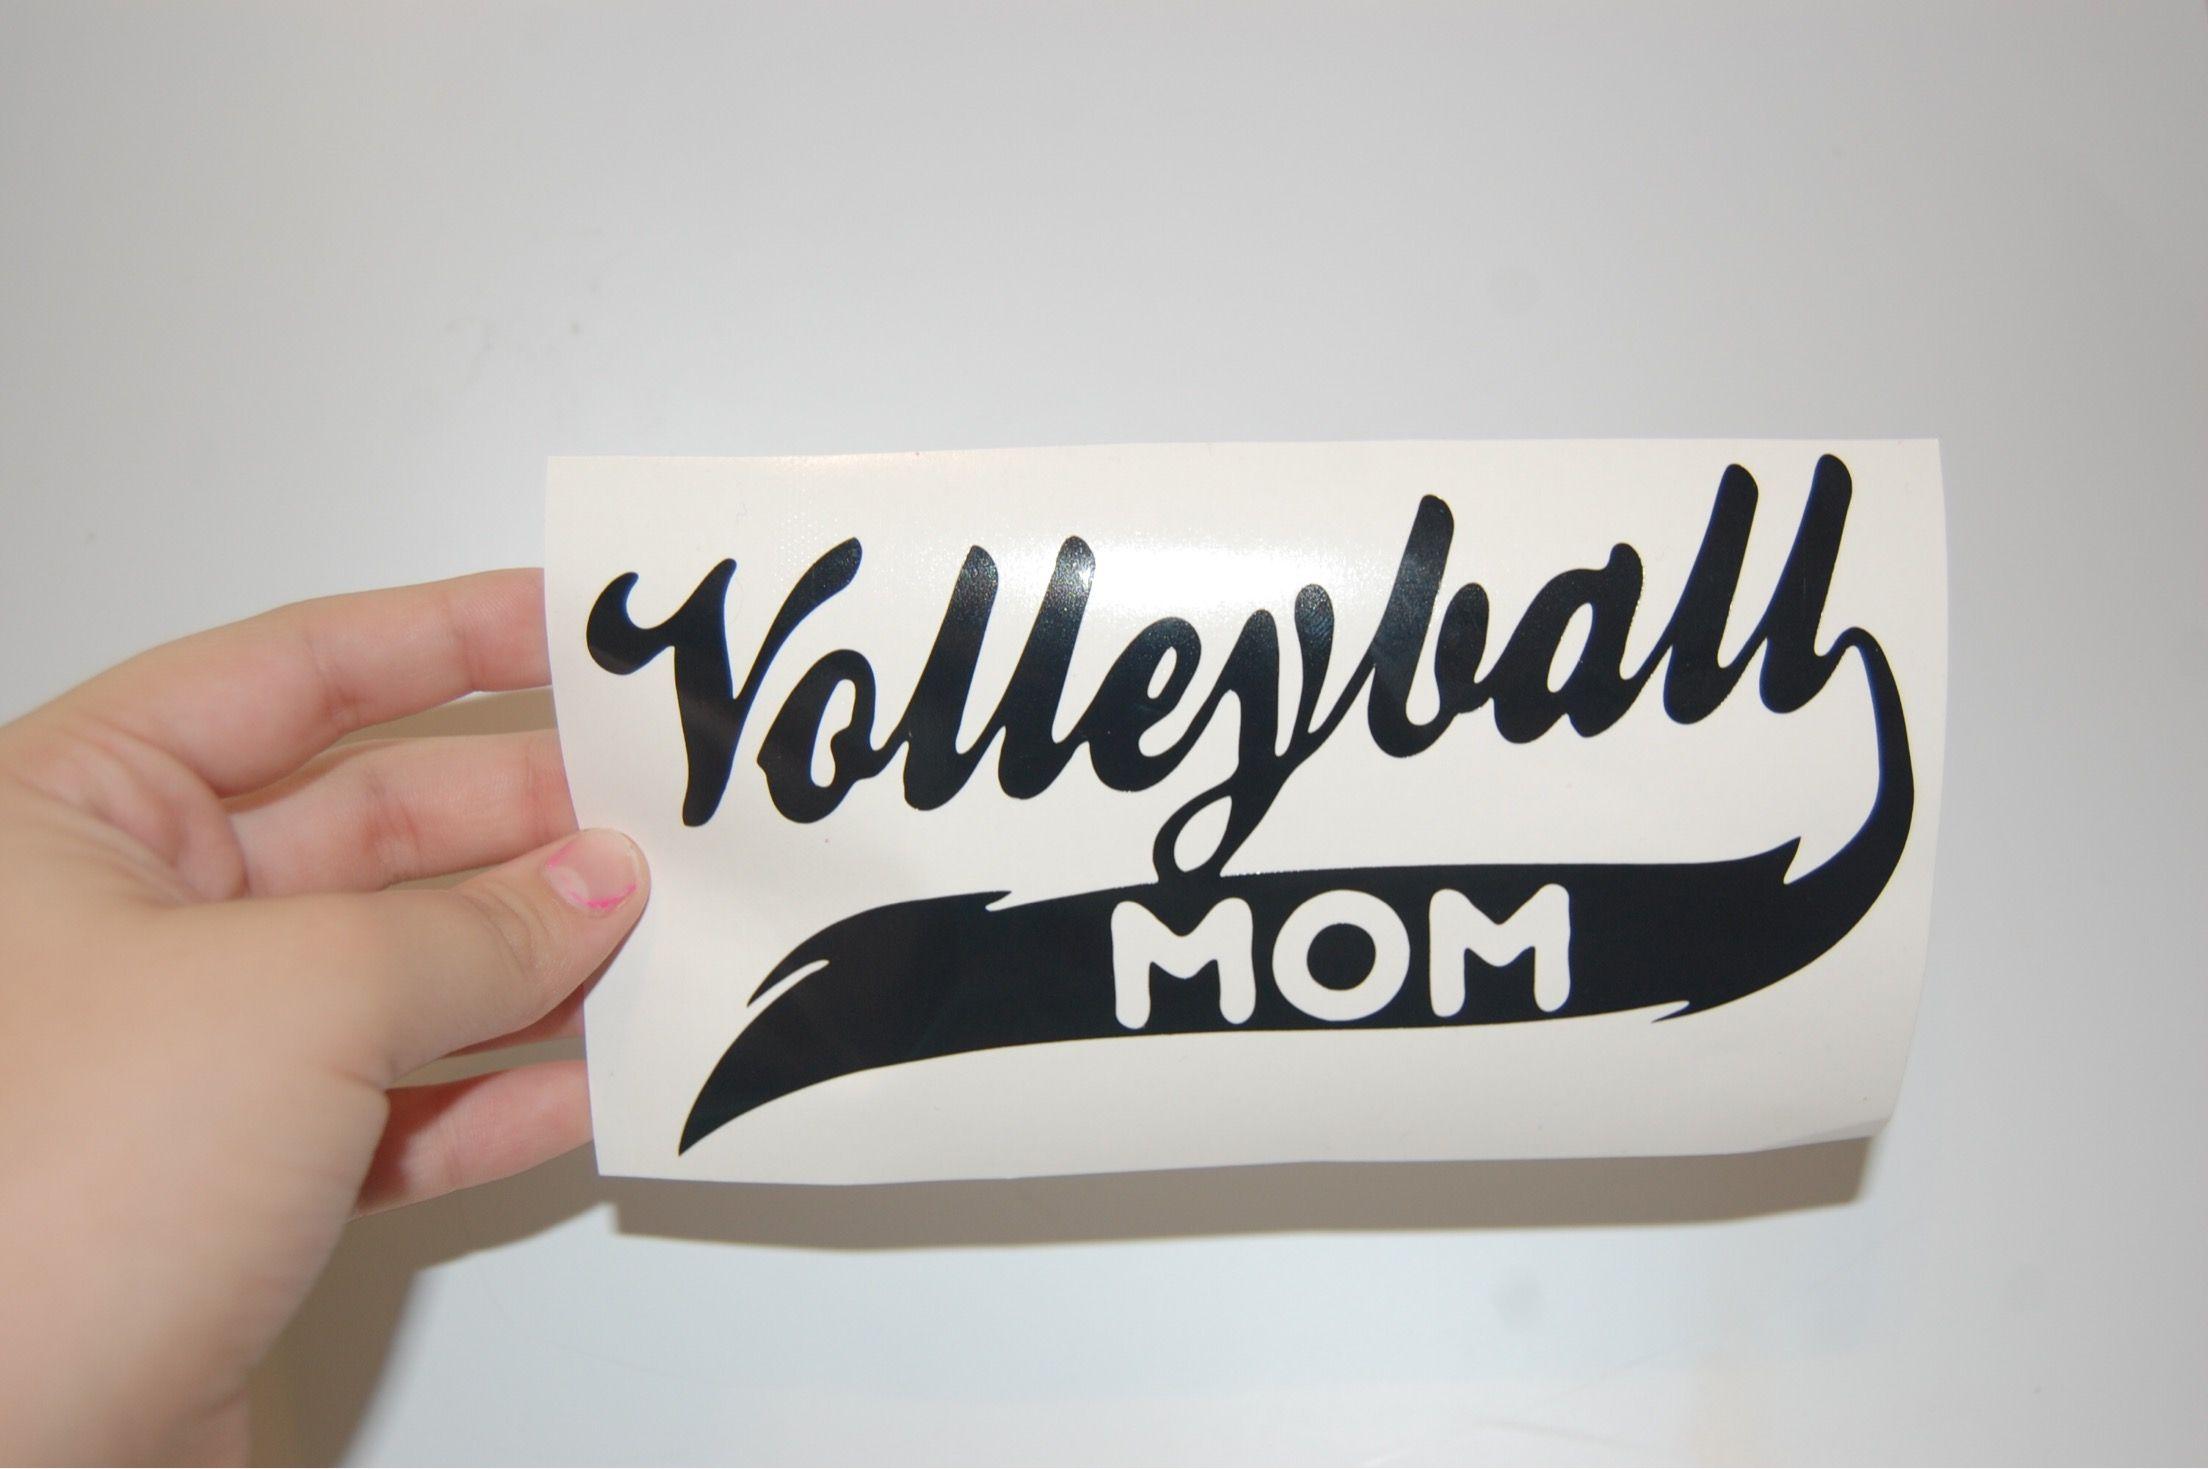 Love Volleyball Sports Vinyl Decal Car Window Decal Laptop Sticker White 3 X2 5 Sports Vinyl Decals Car Decals Vinyl Vinyl Decals [ 1023 x 1024 Pixel ]